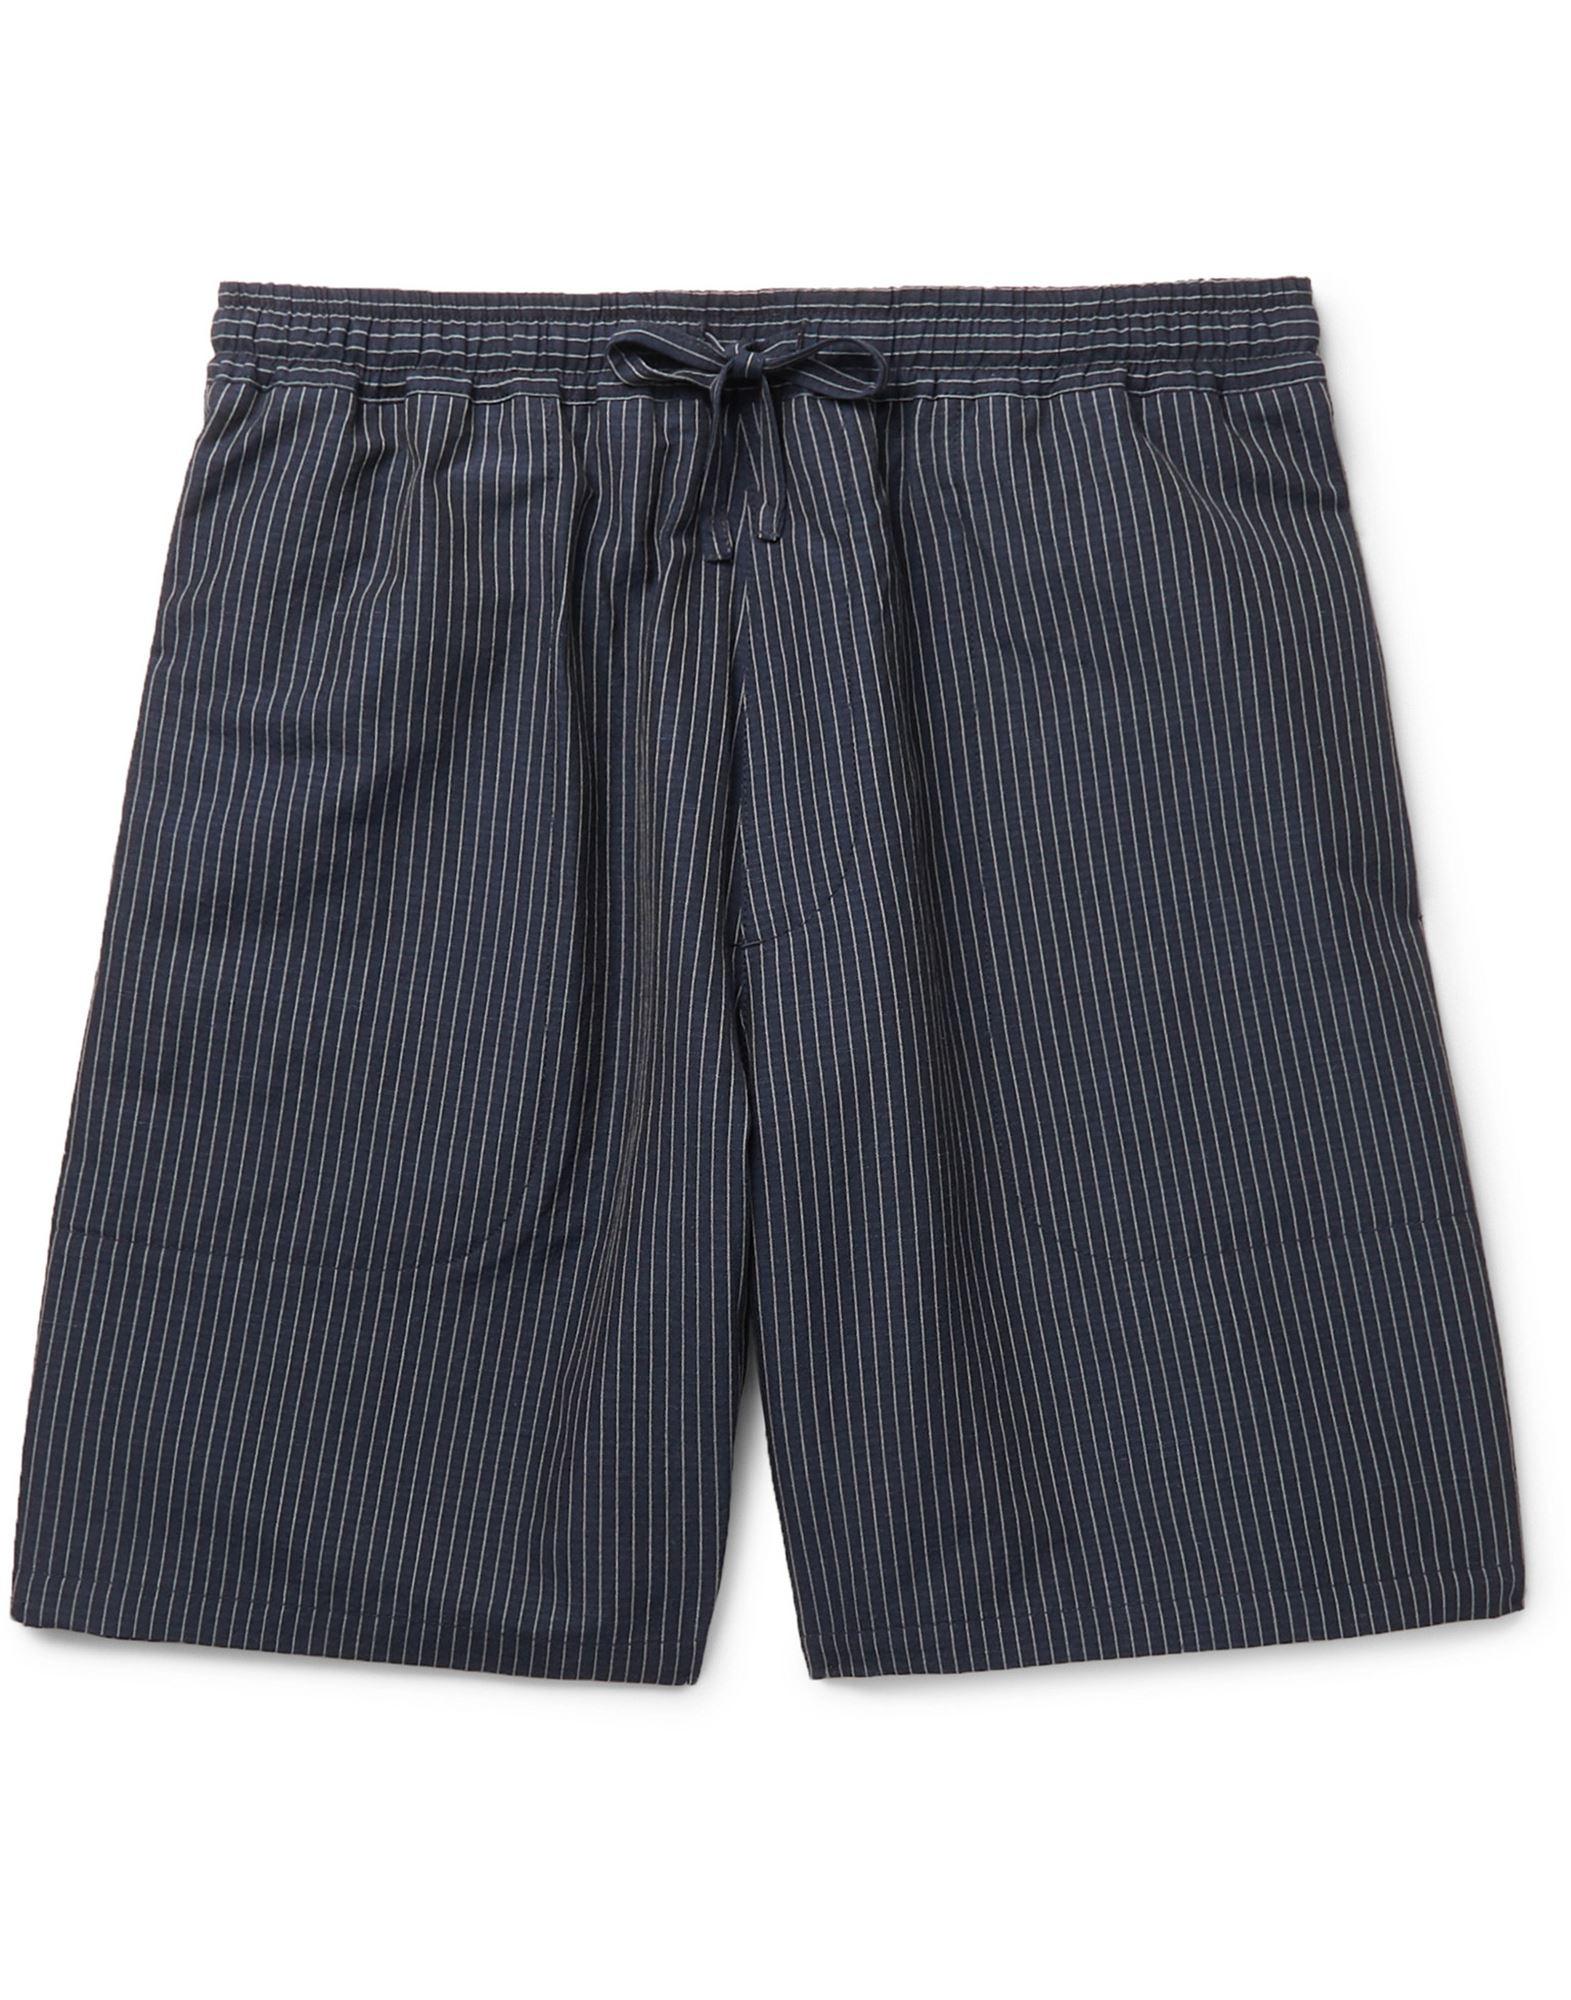 YMC YOU MUST CREATE Шорты и бермуды ymc you must create шорты для плавания